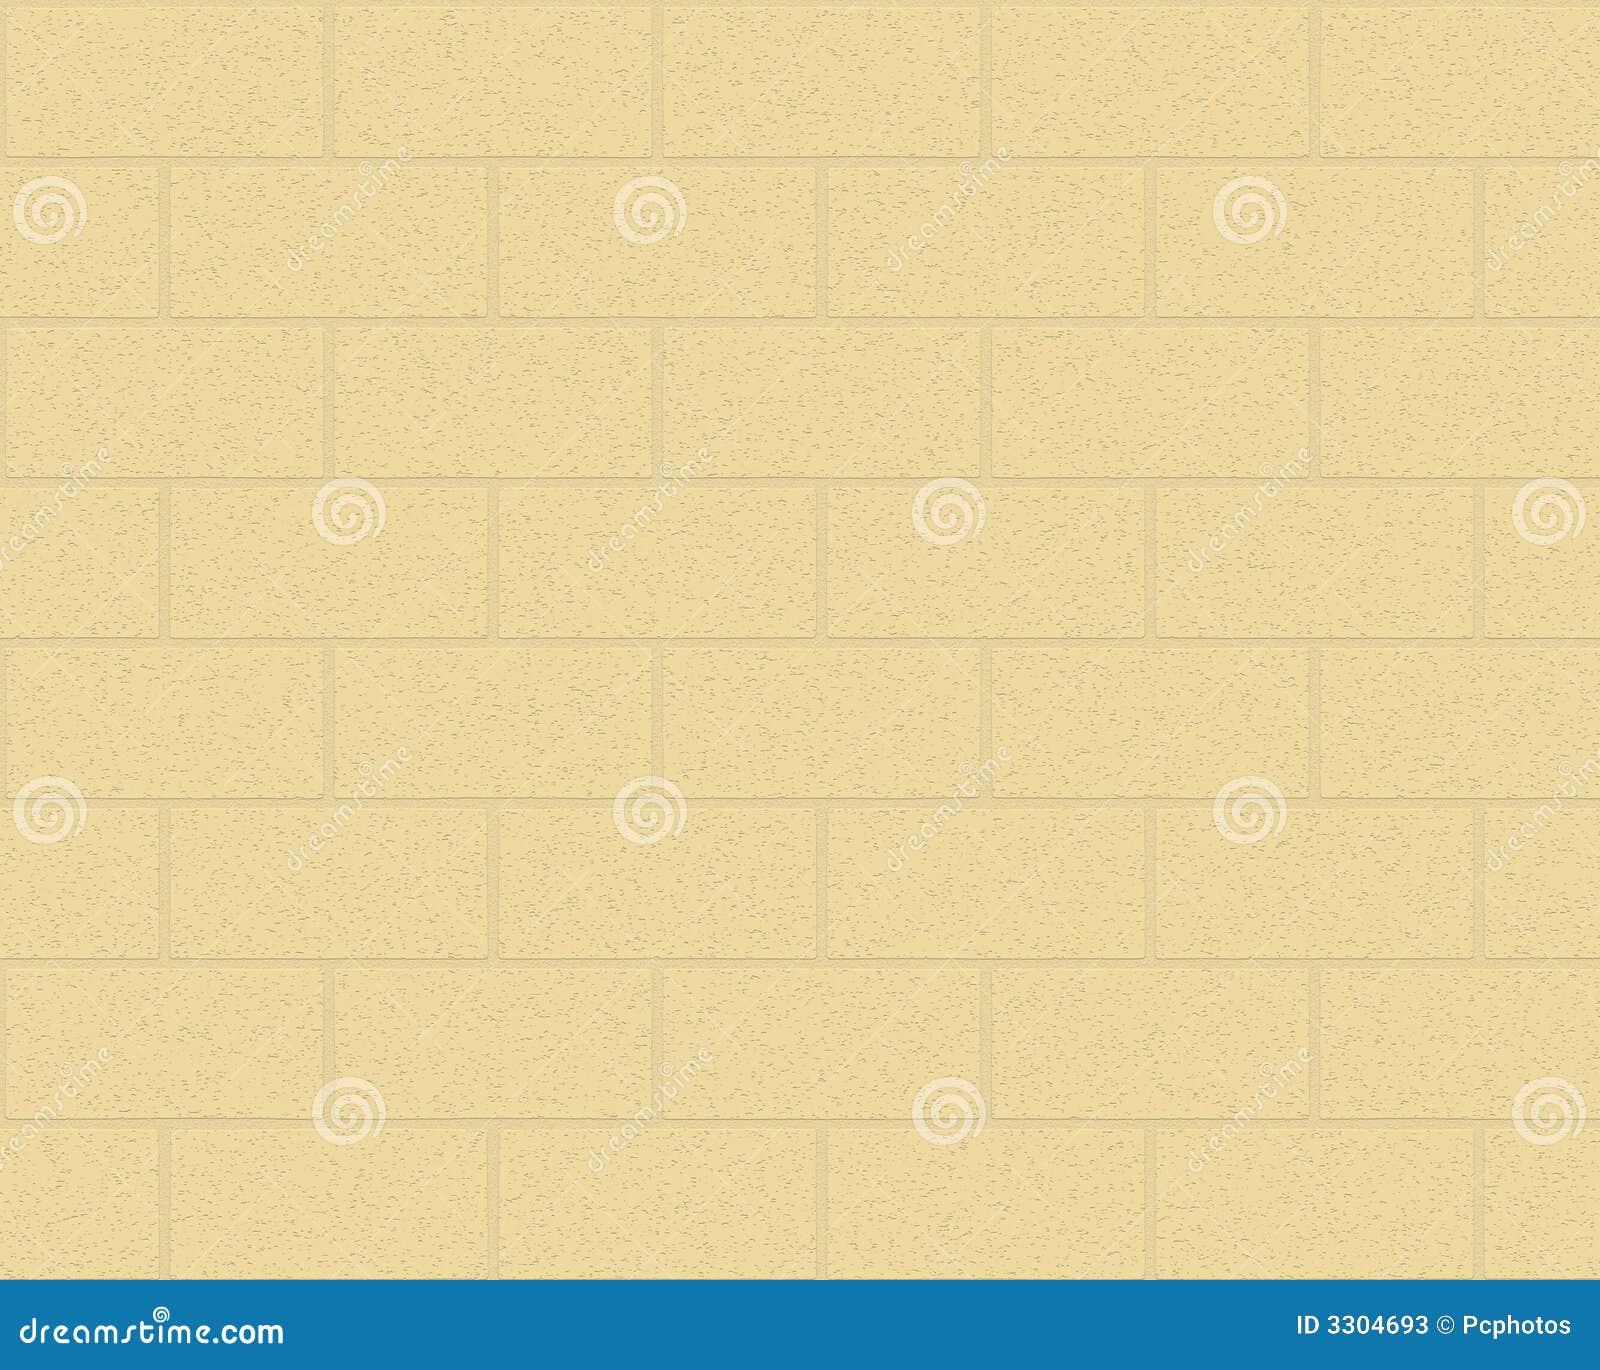 Concrete block background stock illustration. Illustration of ...